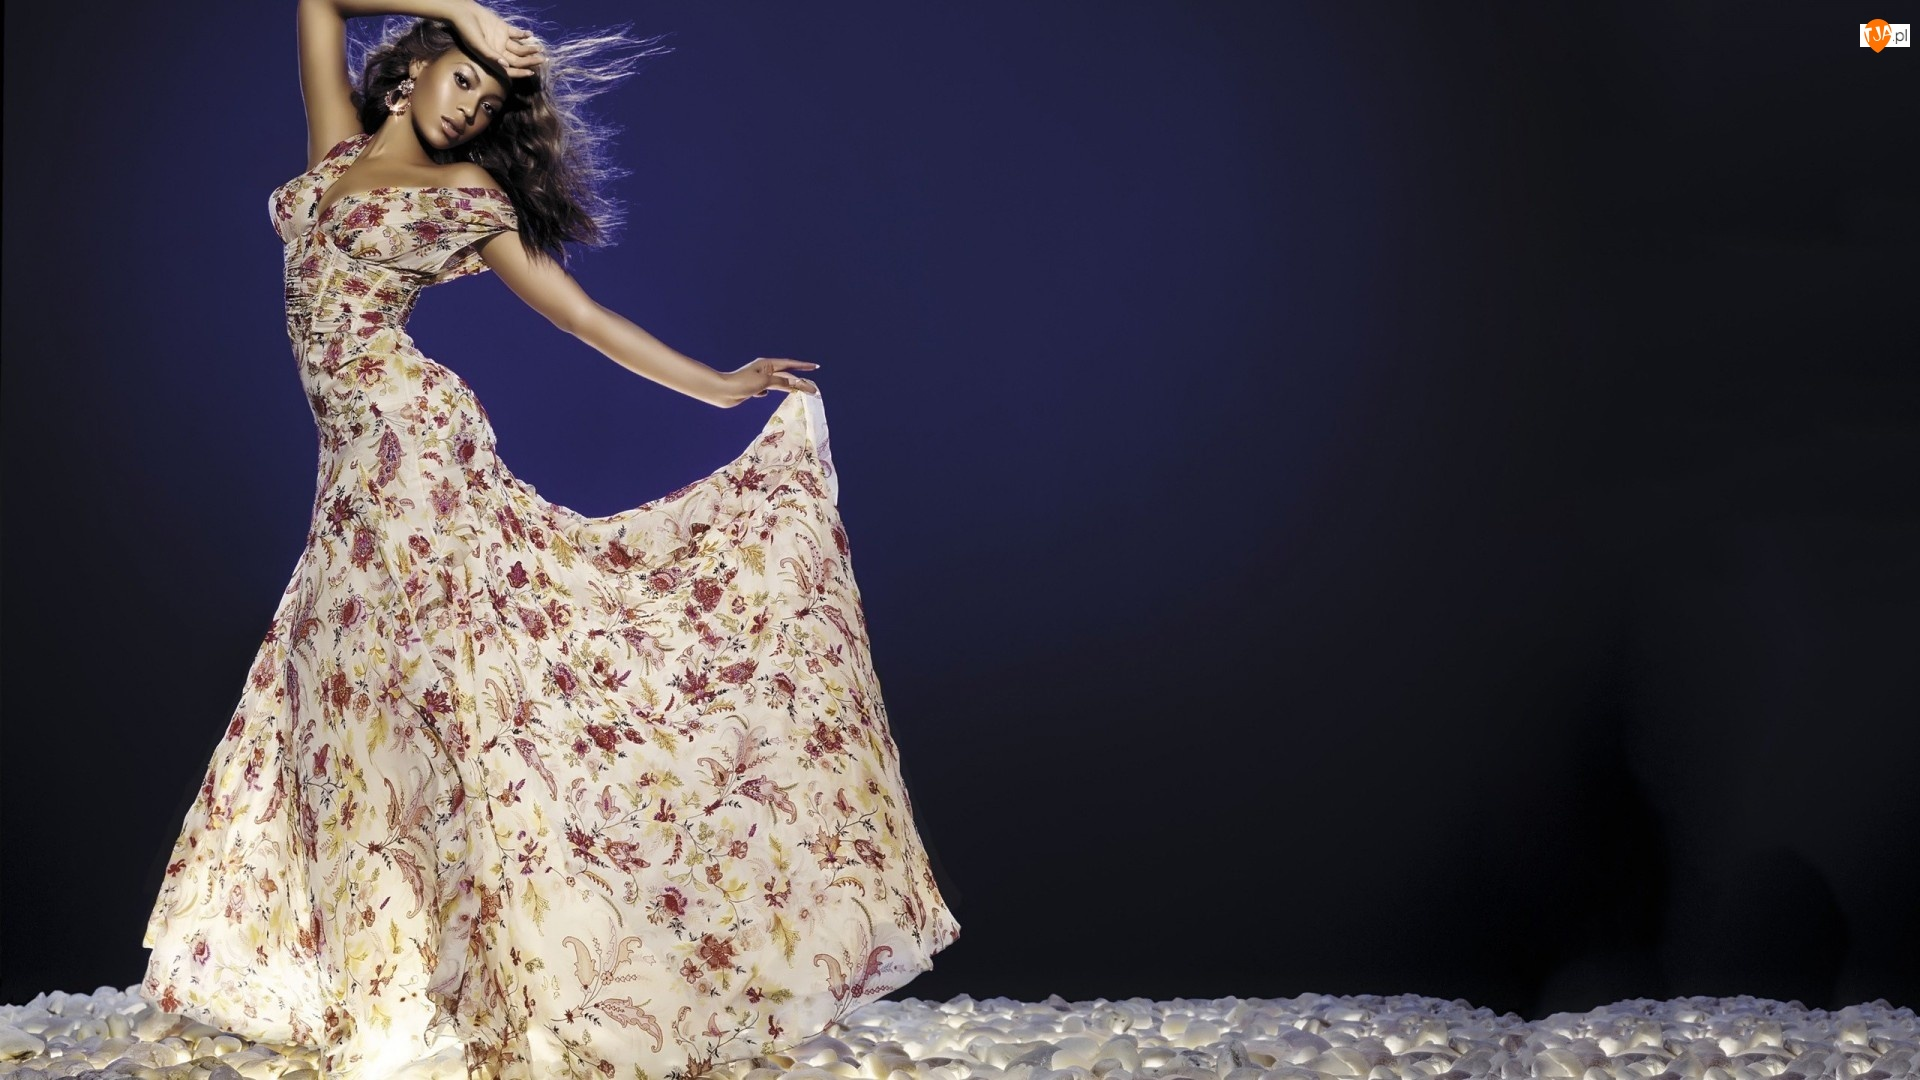 Sukienka, Beyonce Knowles, Kwiecista